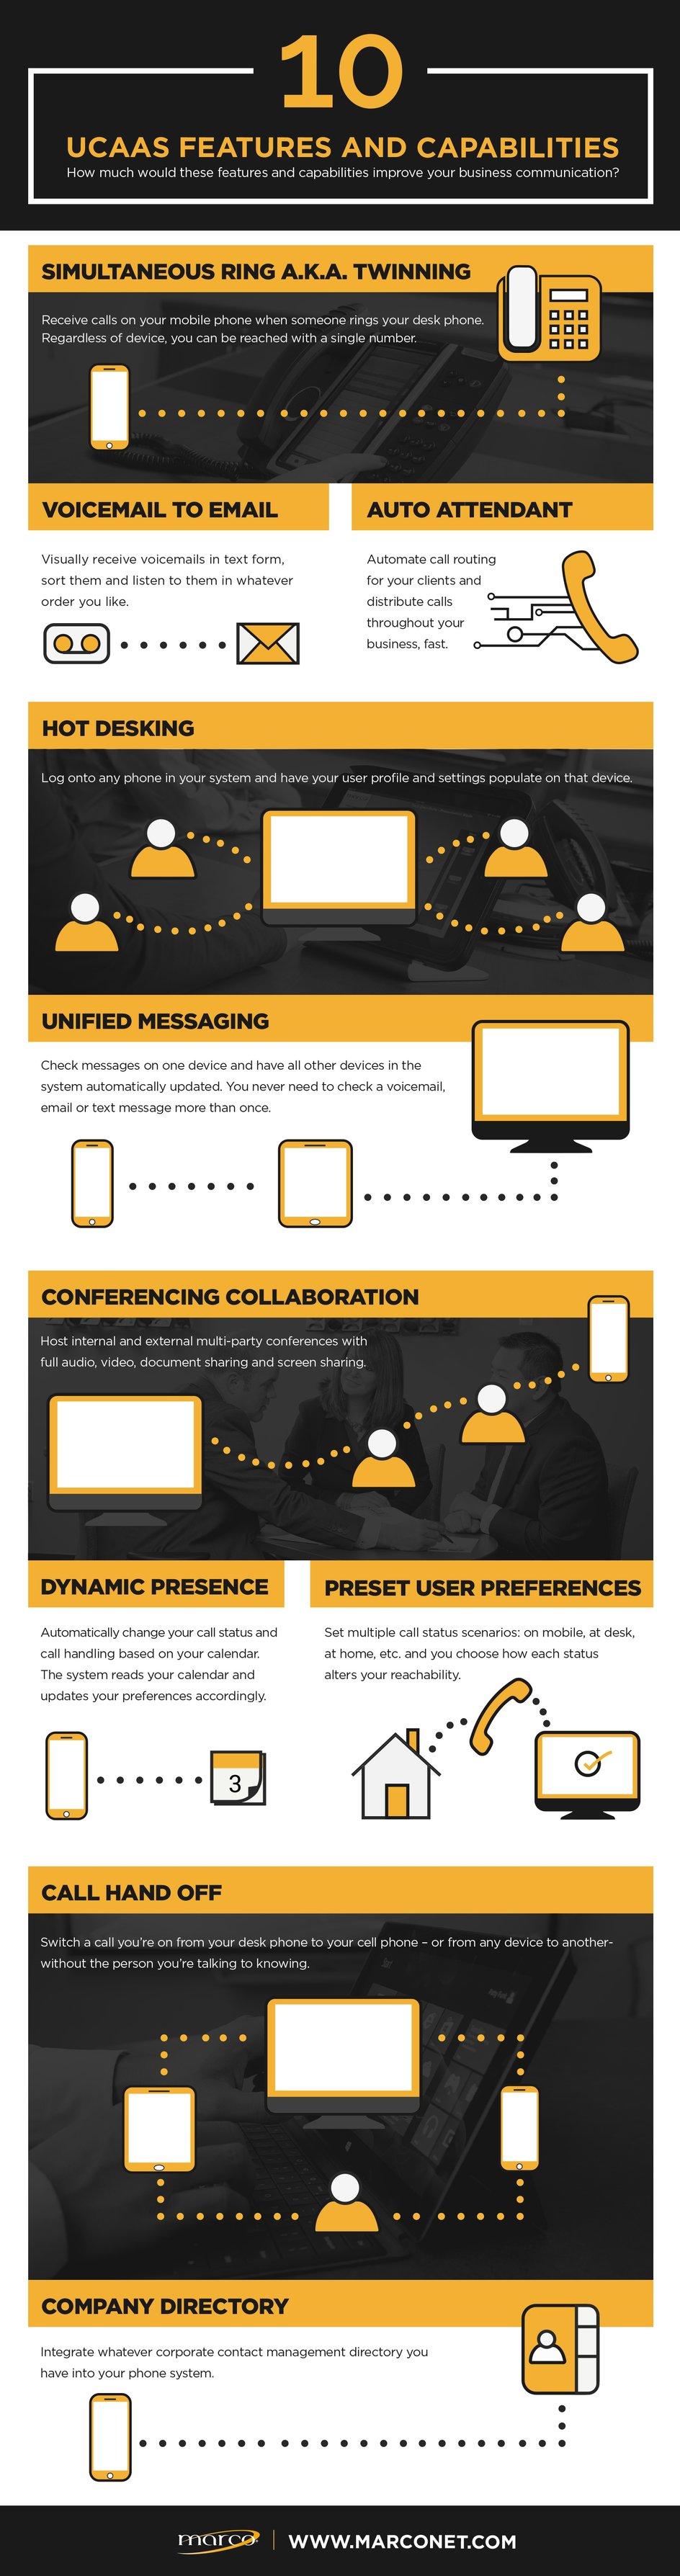 Marco-UCASS-Features-Infographic.jpg